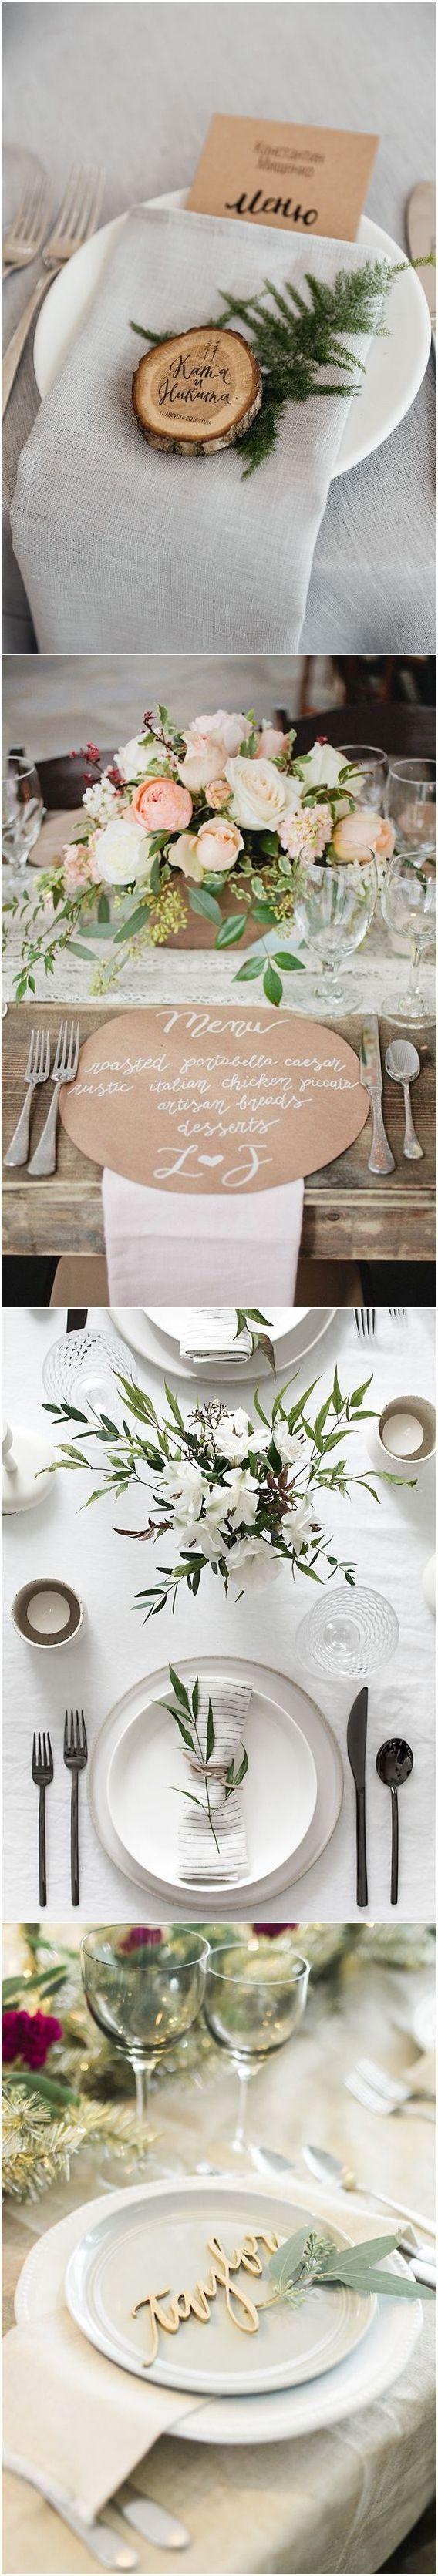 Pin by Екатерина =) on Свадебные идеи | Pinterest | Wedding, Country ...